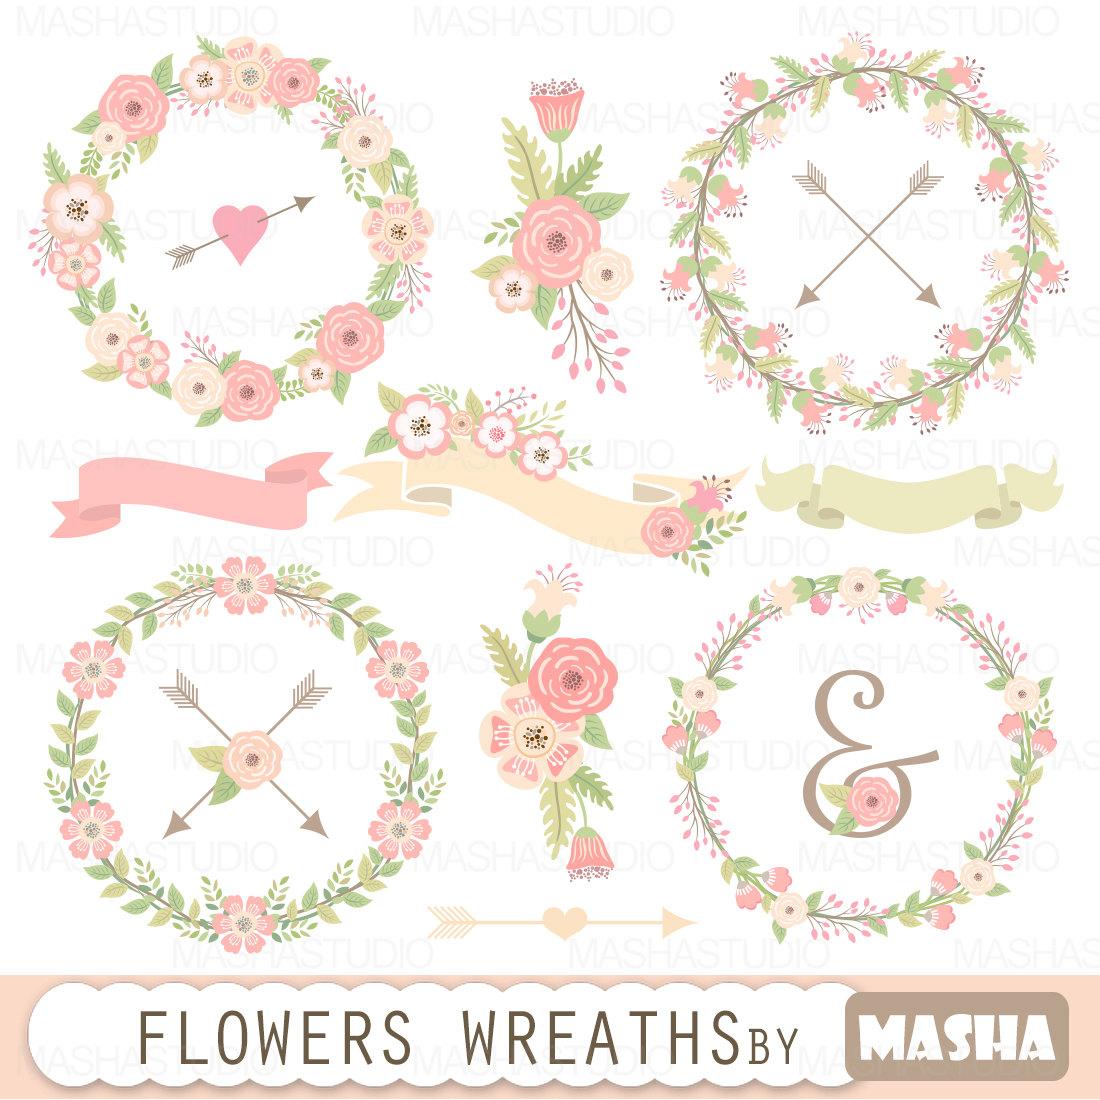 Wedding flowers wreaths clipart: